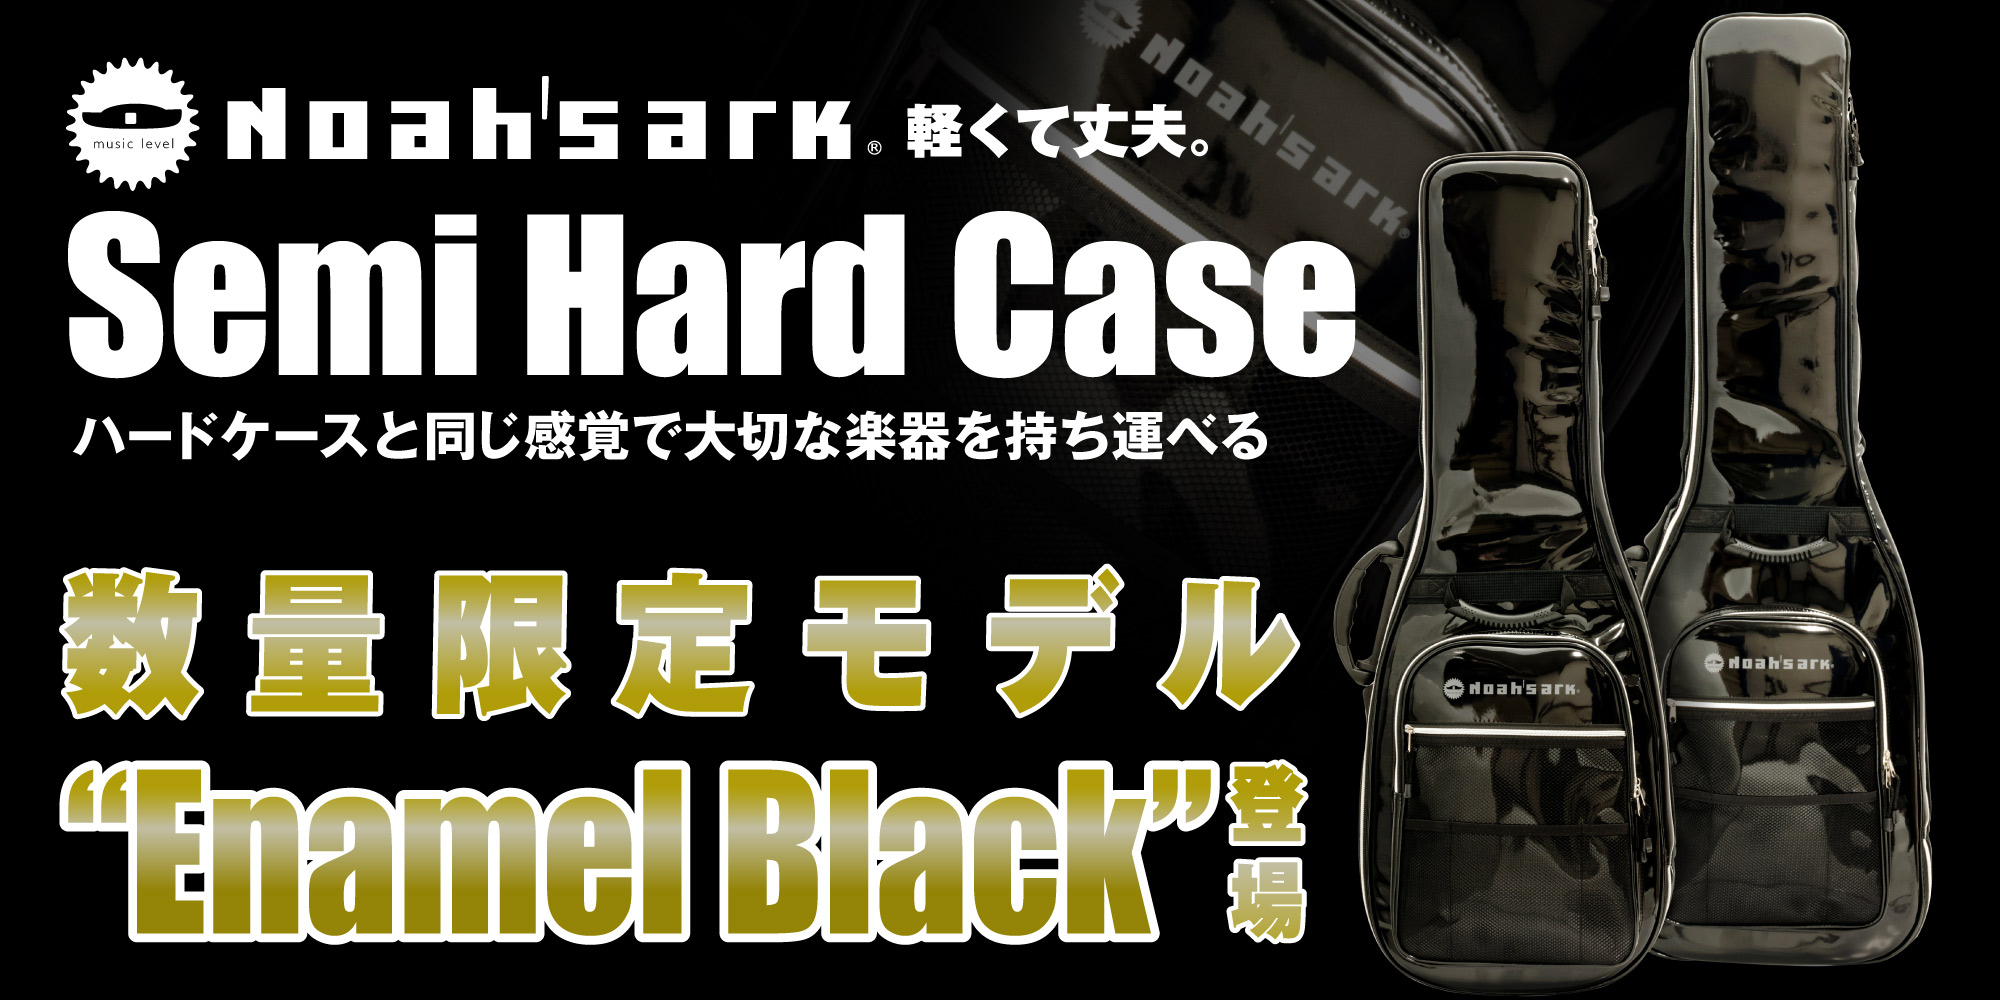 "Noah'sark Semi Hard Case数量限定モデル""Enamel Black""が登場!"